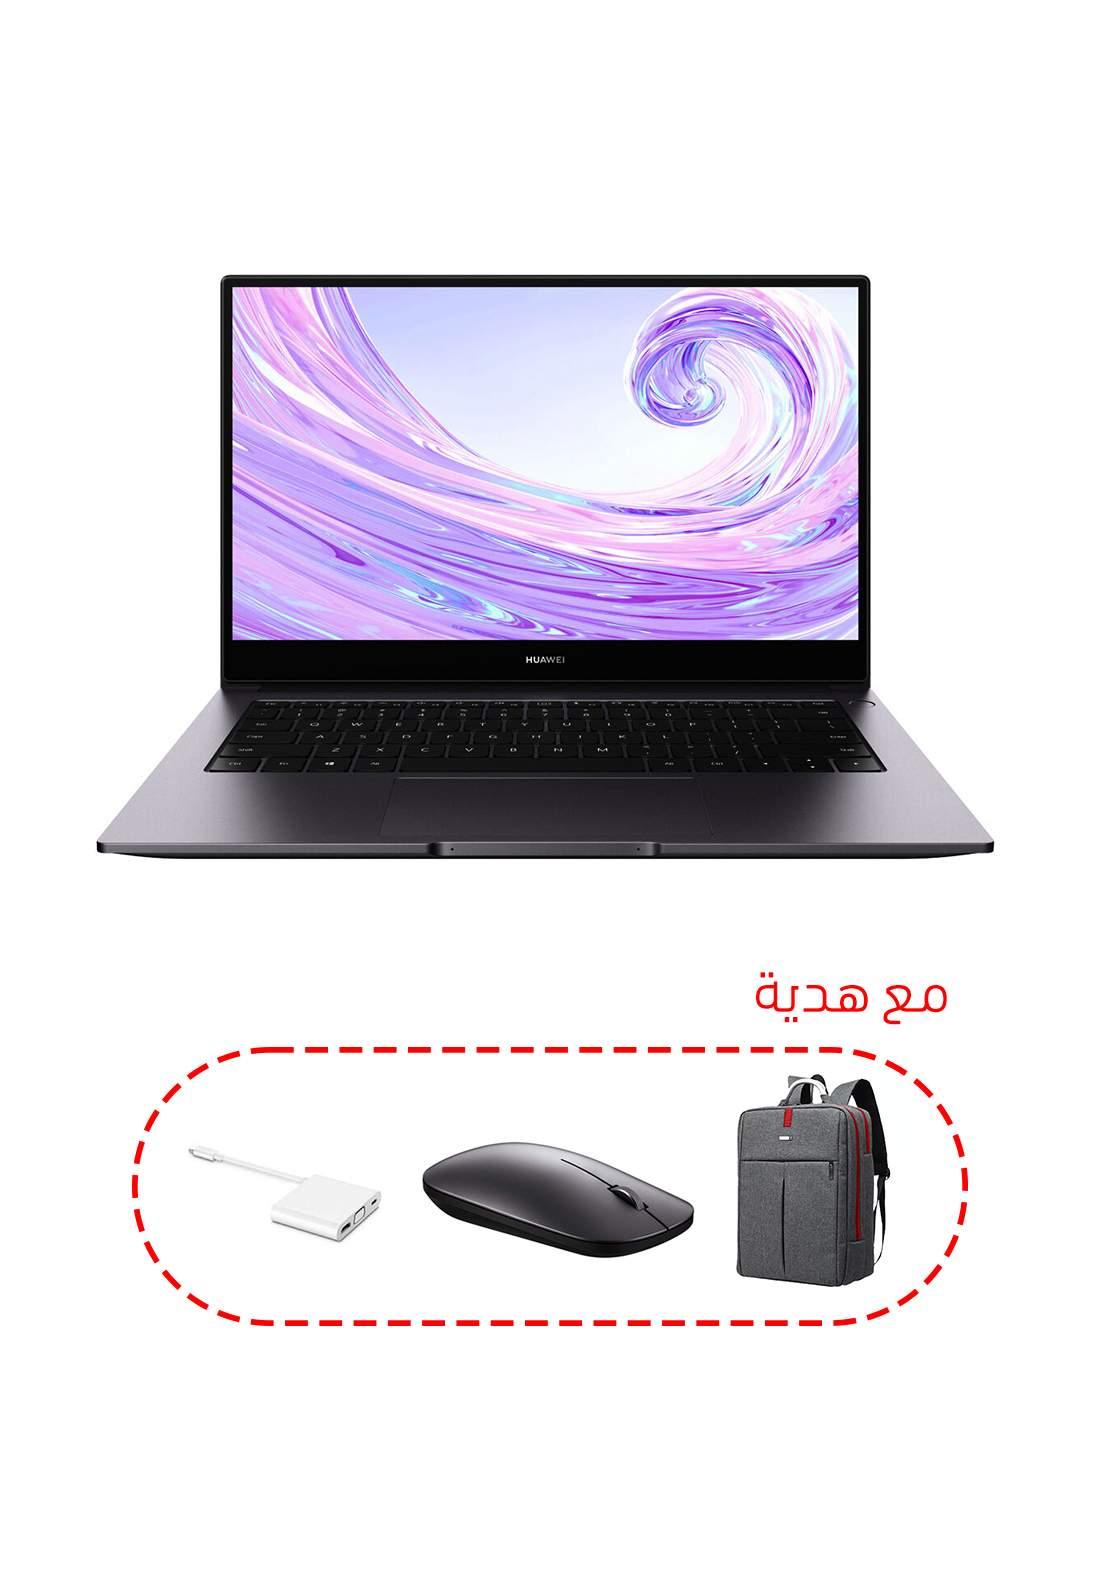 Huawei MateBook D14 - Core i5-10210U - 8 GB RAM - 512 GB SSD - Gray